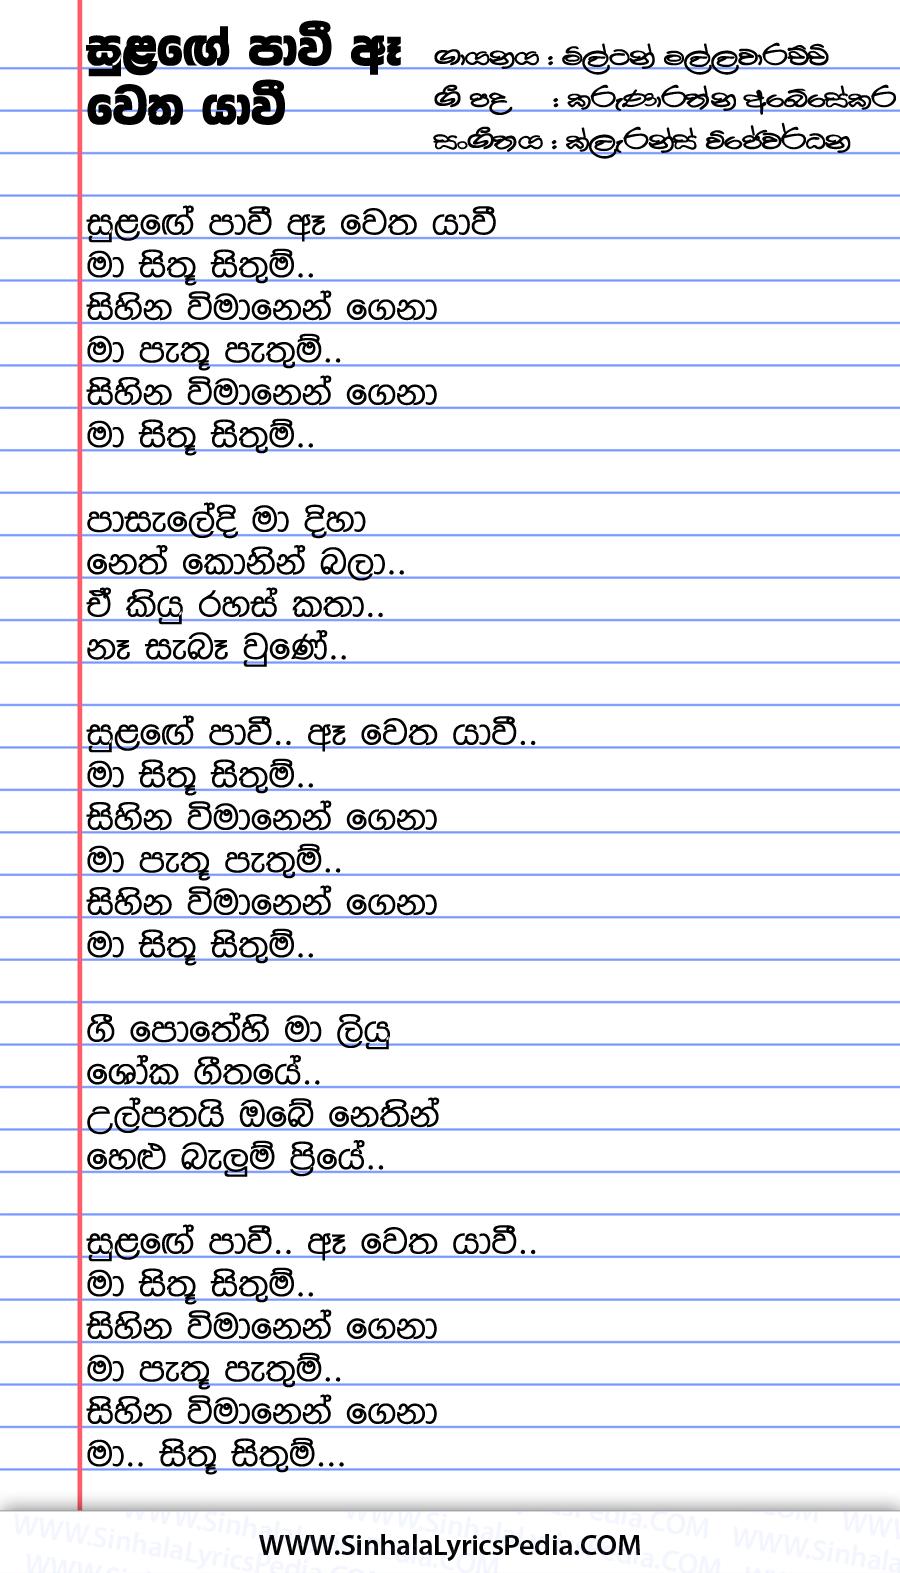 Sulage Pawee A Wetha Yawi Song Lyrics